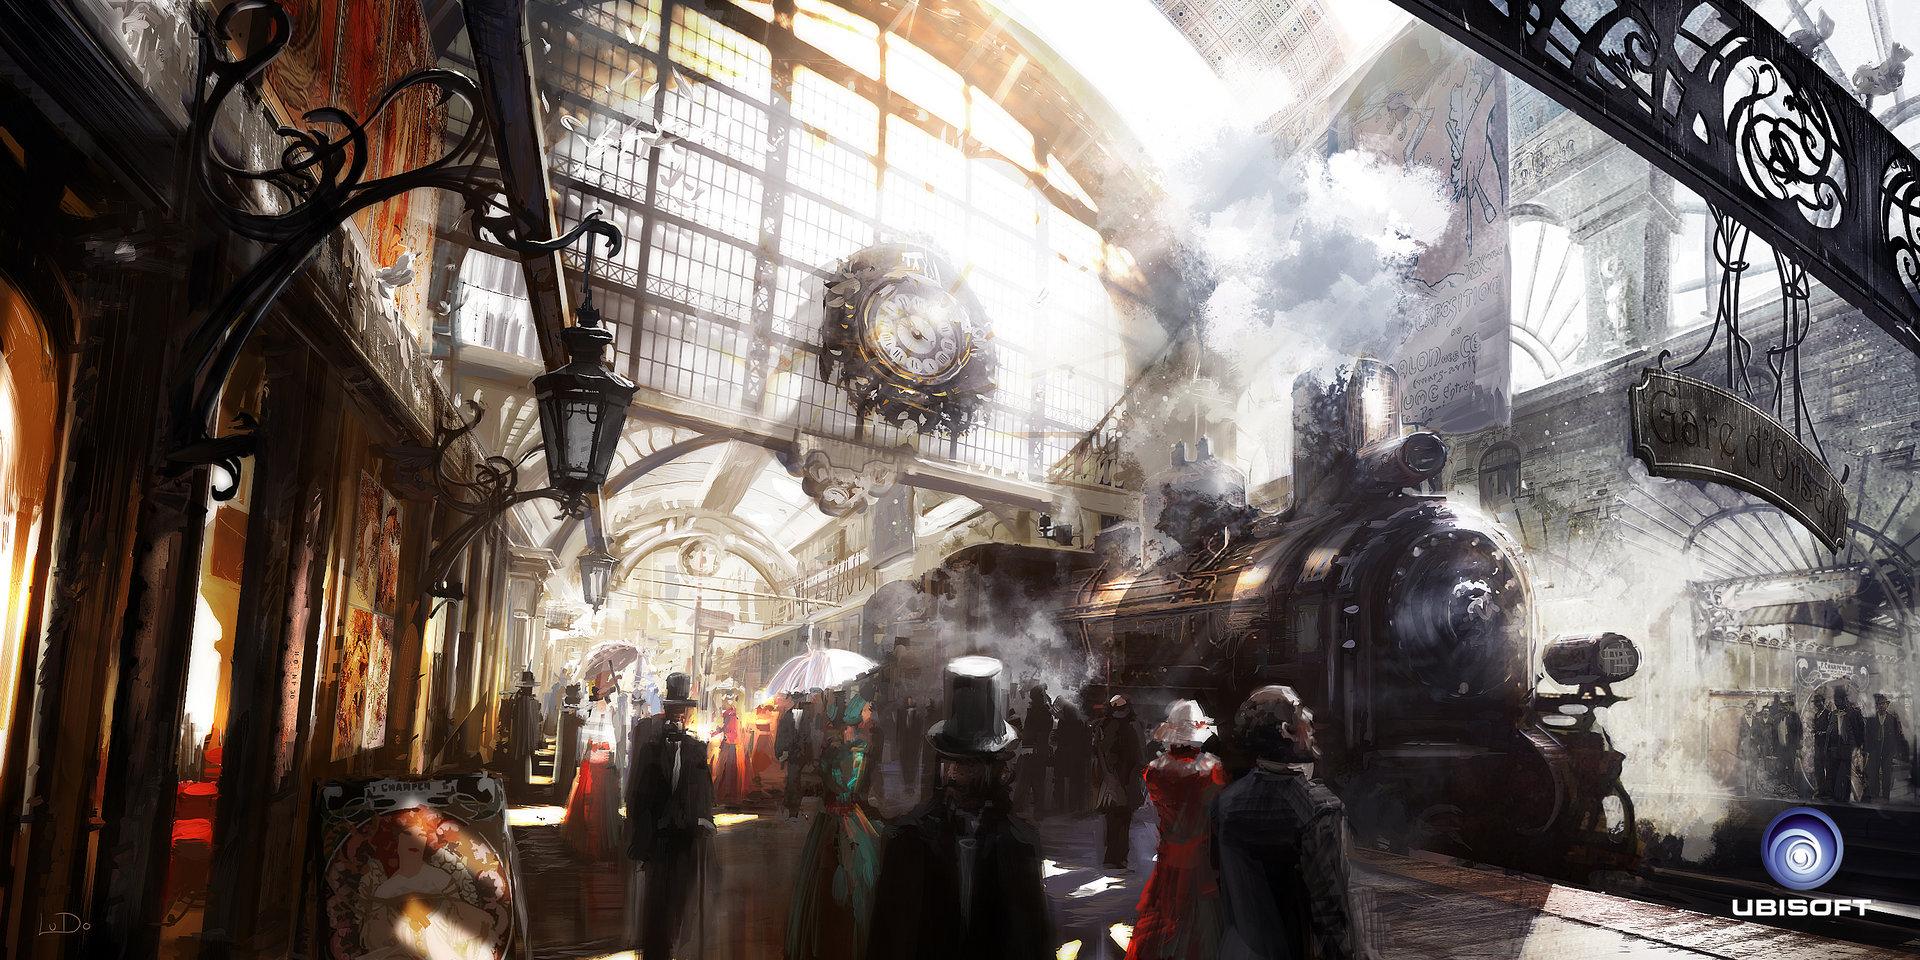 https://cdn.artstation.com/p/assets/images/images/000/337/460/large/ludovic-ribardiere-gare-art-nouveau-wip10.jpg?1417744366